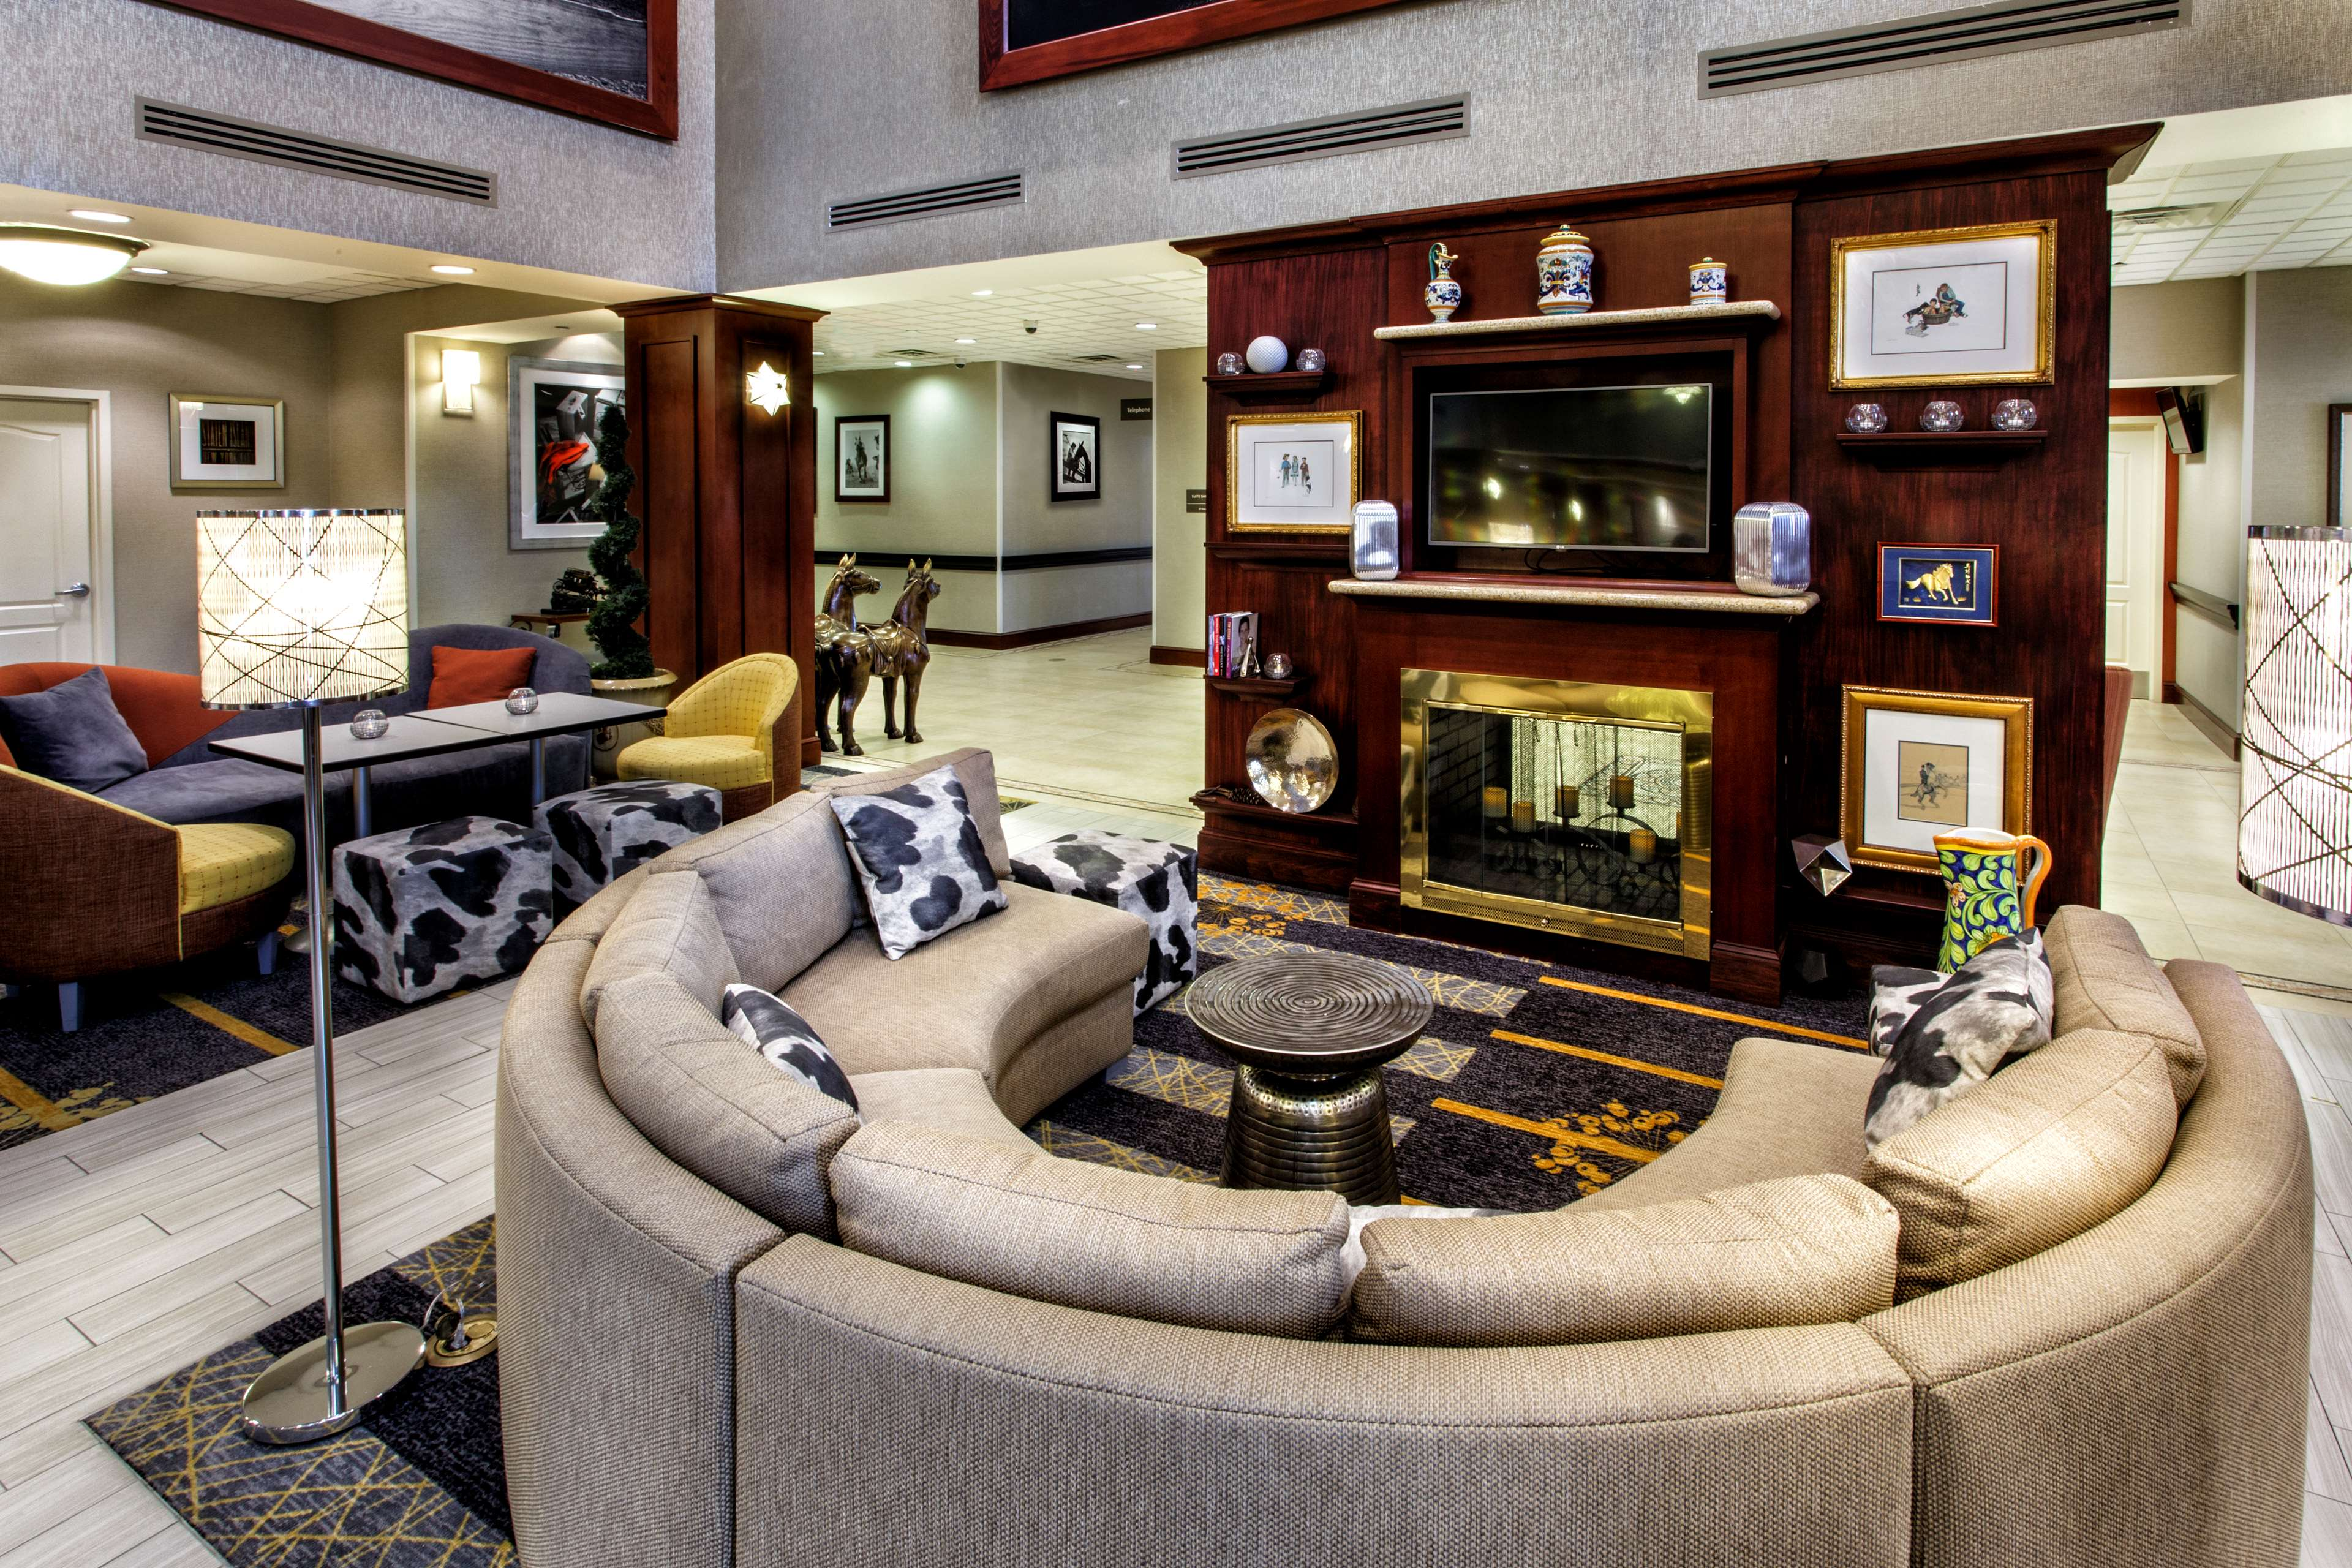 Hampton Inn & Suites Staten Island image 11